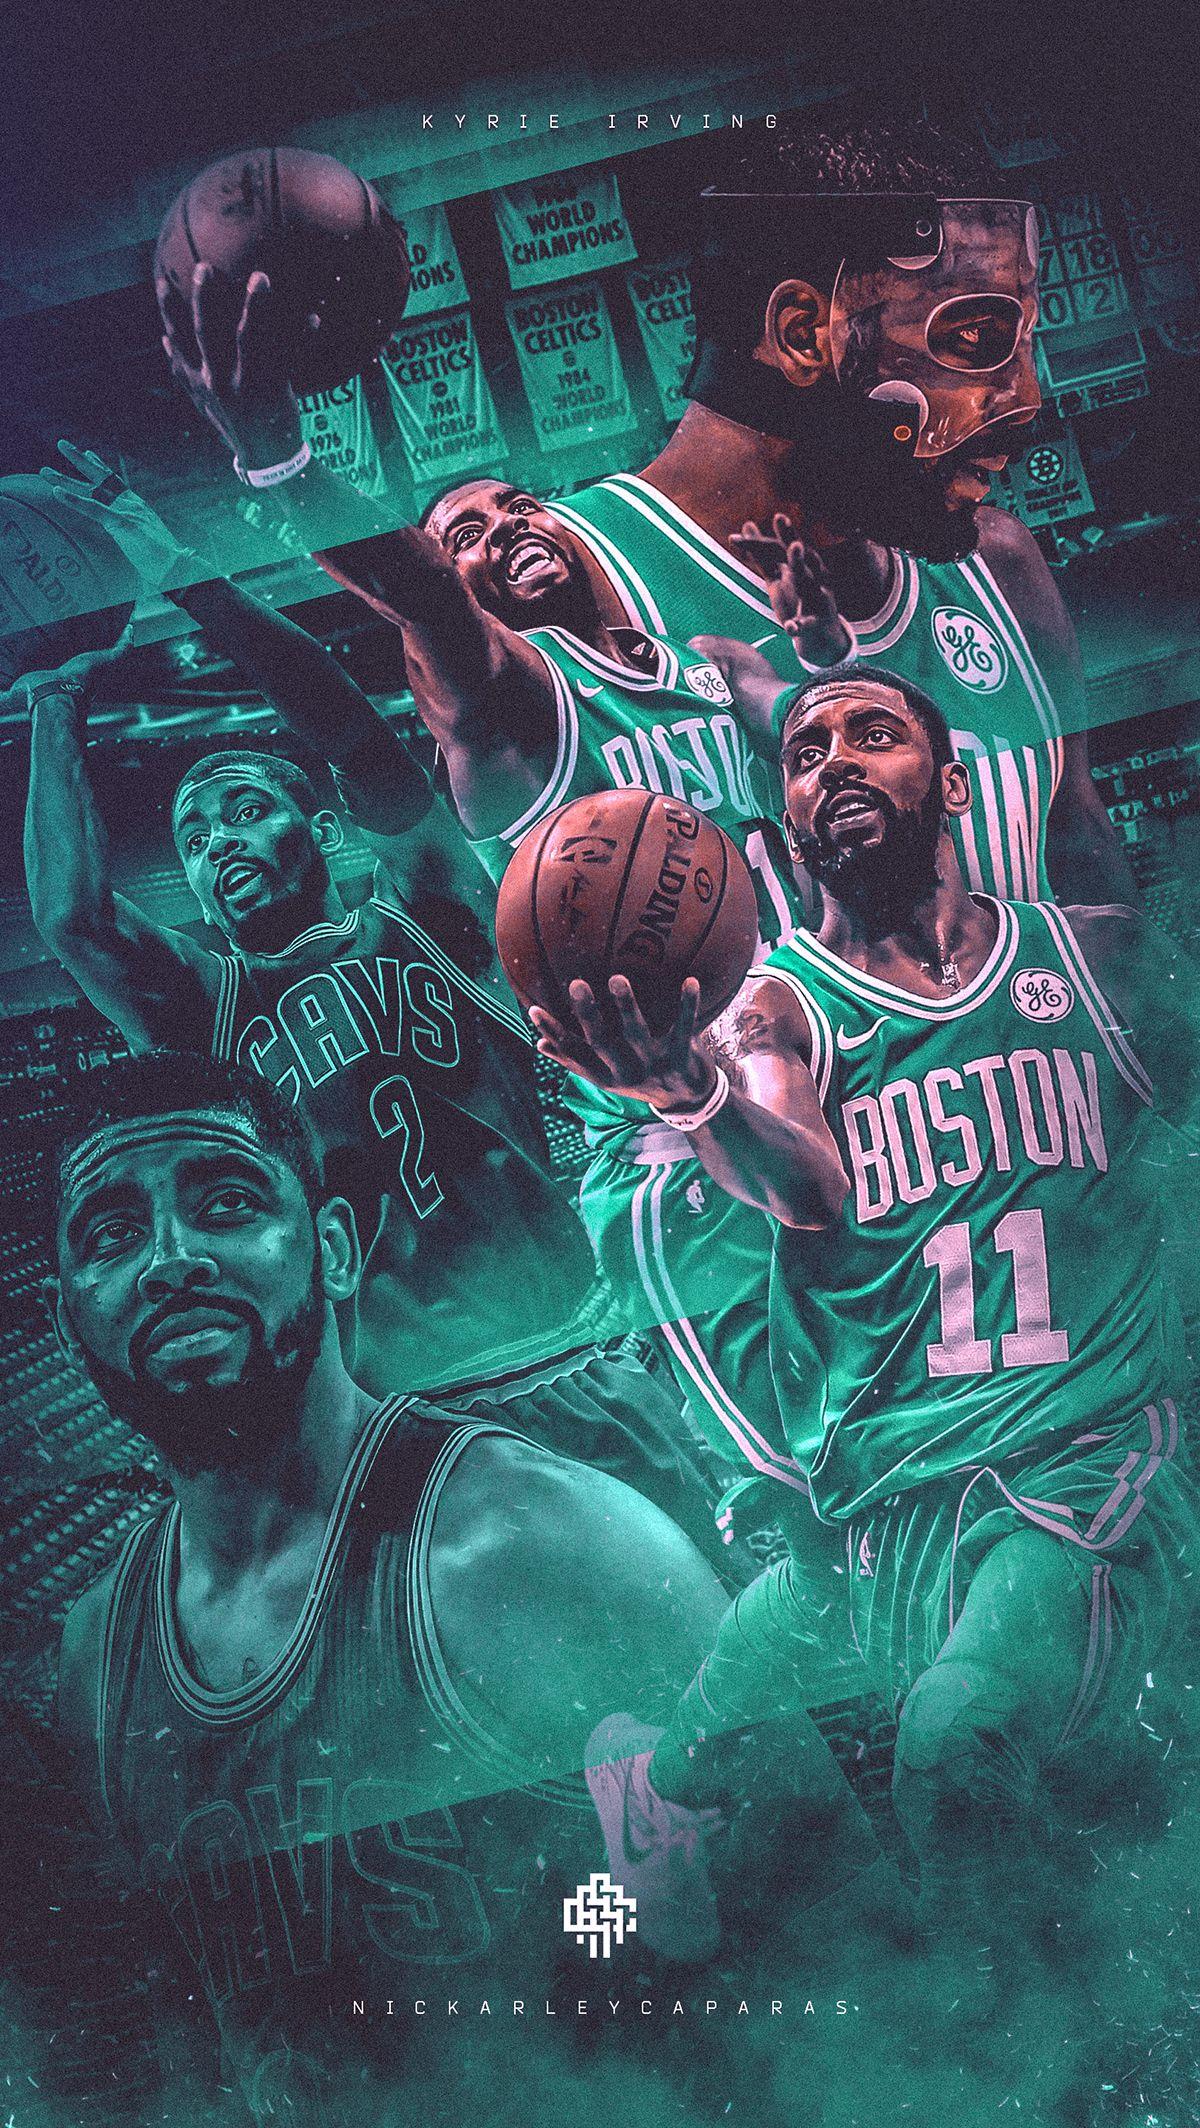 Nba Art Kyrie Irving Celtics Cavaliers Wallpaper On Behance Cavaliers Wallpaper Kyrie Irving Celtics Nba Art